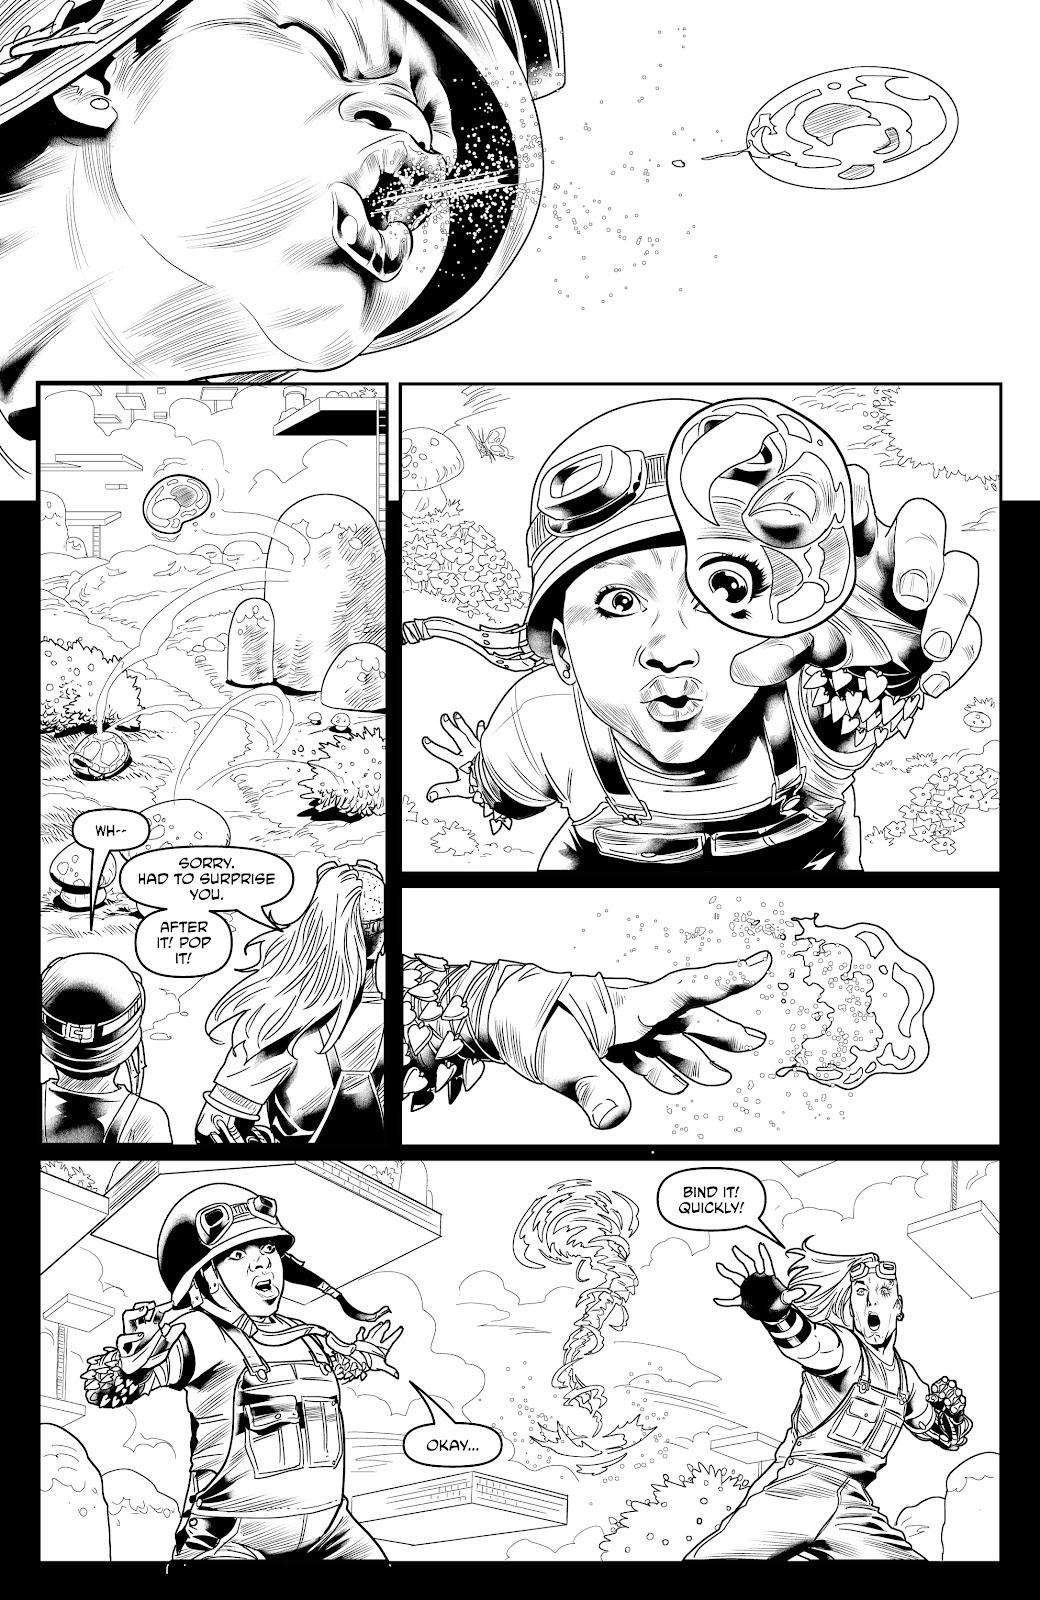 Read online Alan Moore's Cinema Purgatorio comic -  Issue #17 - 27